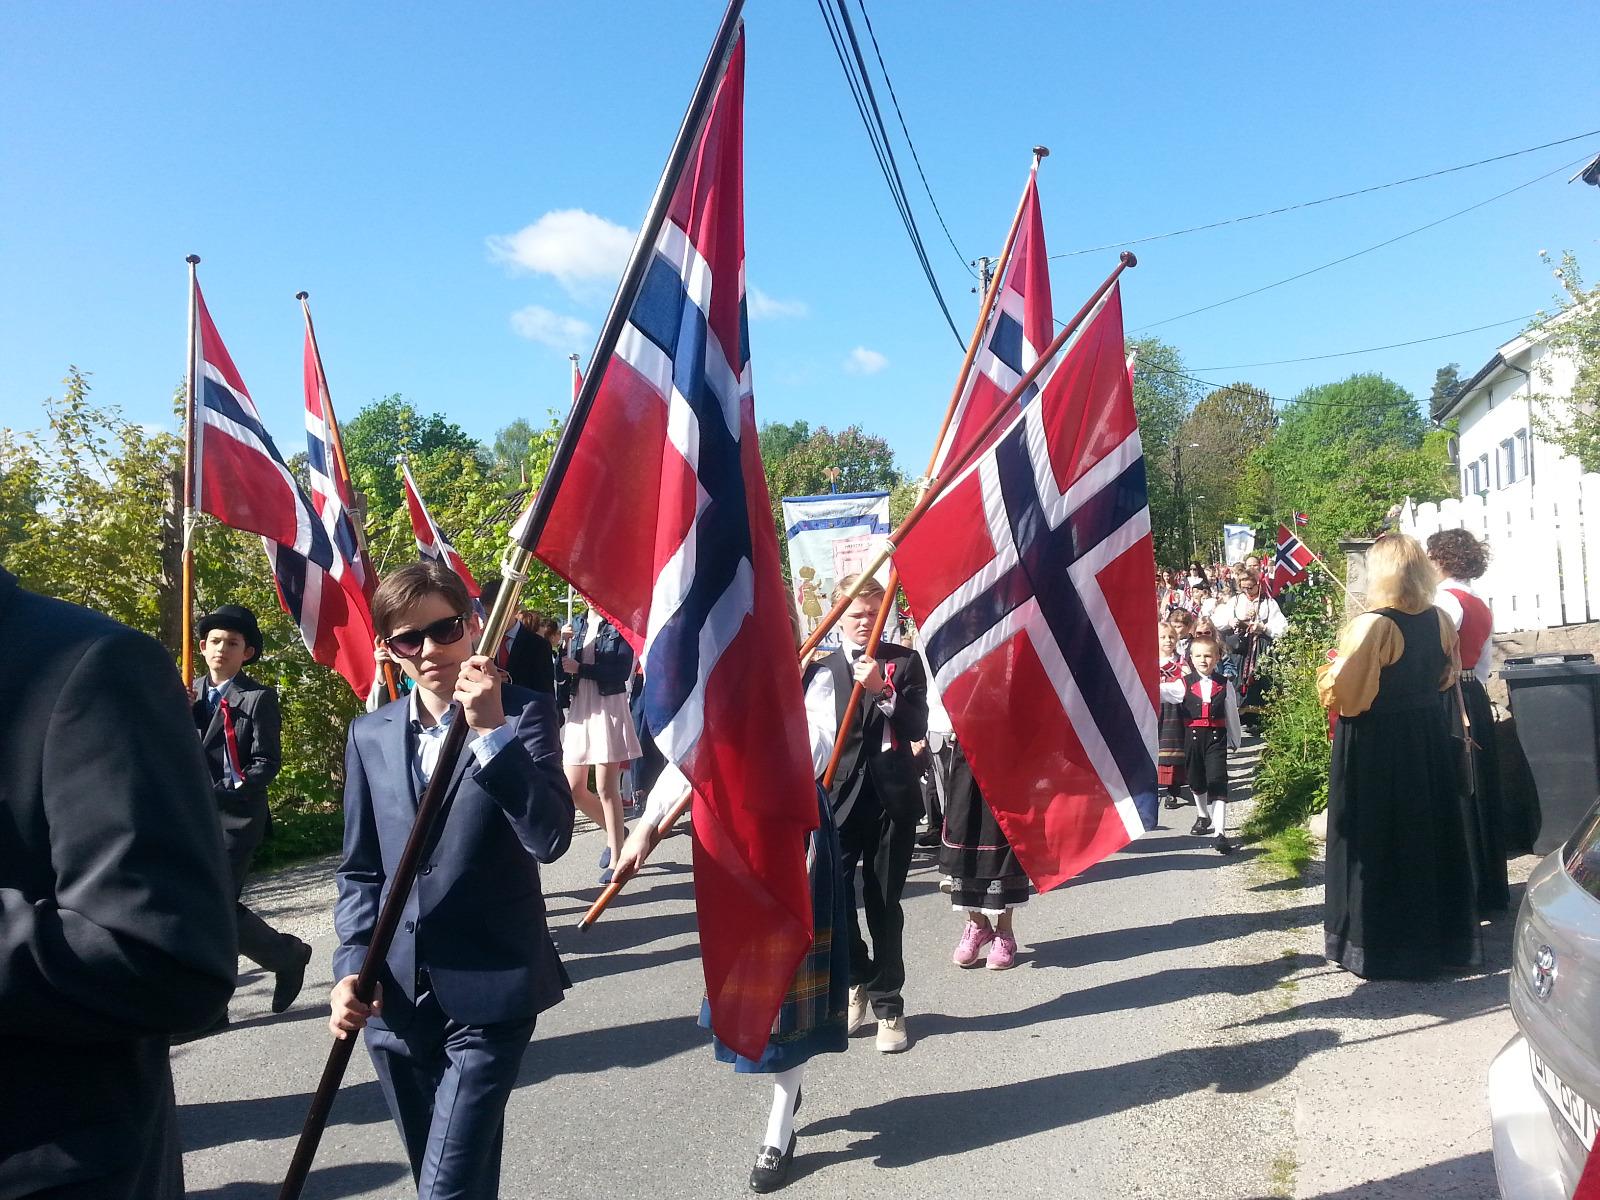 Hipp Hipp Hurra - 17. Mai, Norwegen feiert Geburtstag